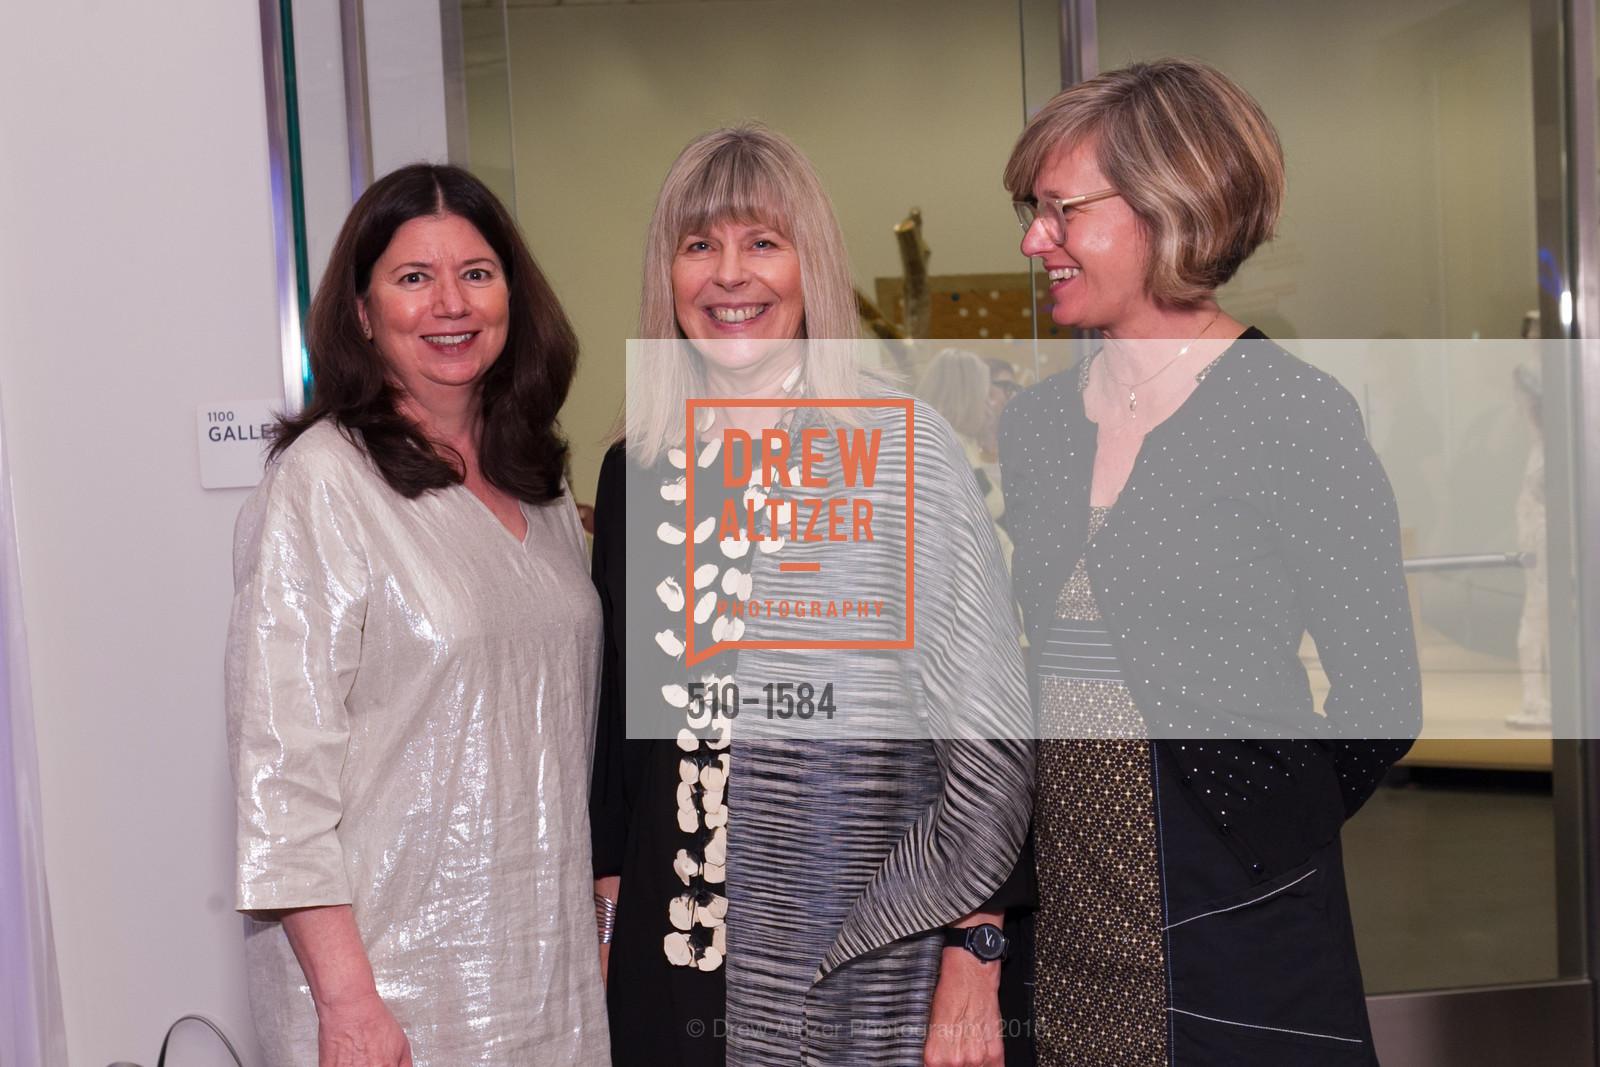 Pauline Shaver, Katherine Resener, Alison Pebworth, Photo #510-1584